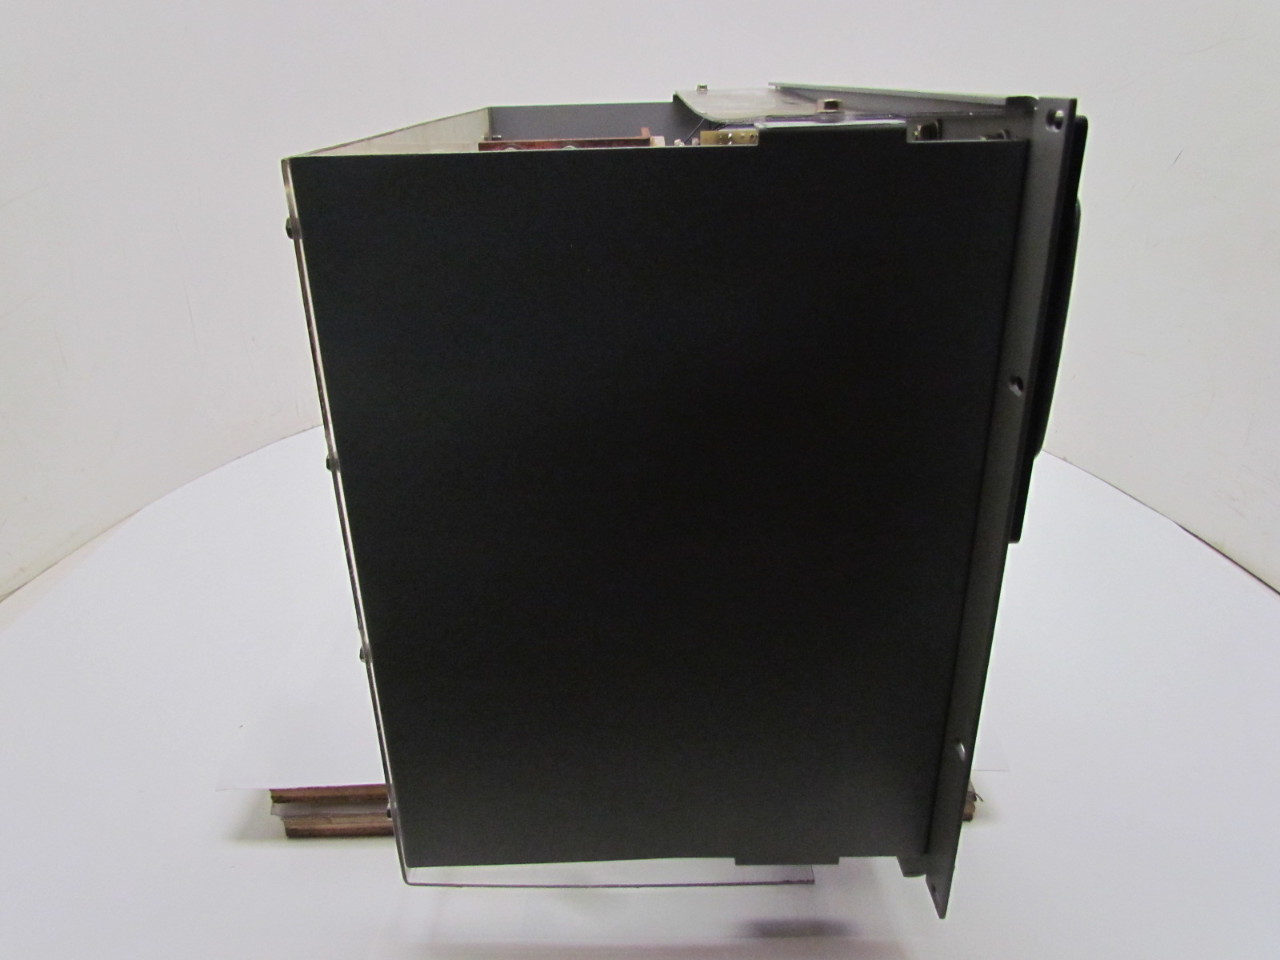 peco ii pbd tpl bk dual 200a load distribution. Black Bedroom Furniture Sets. Home Design Ideas